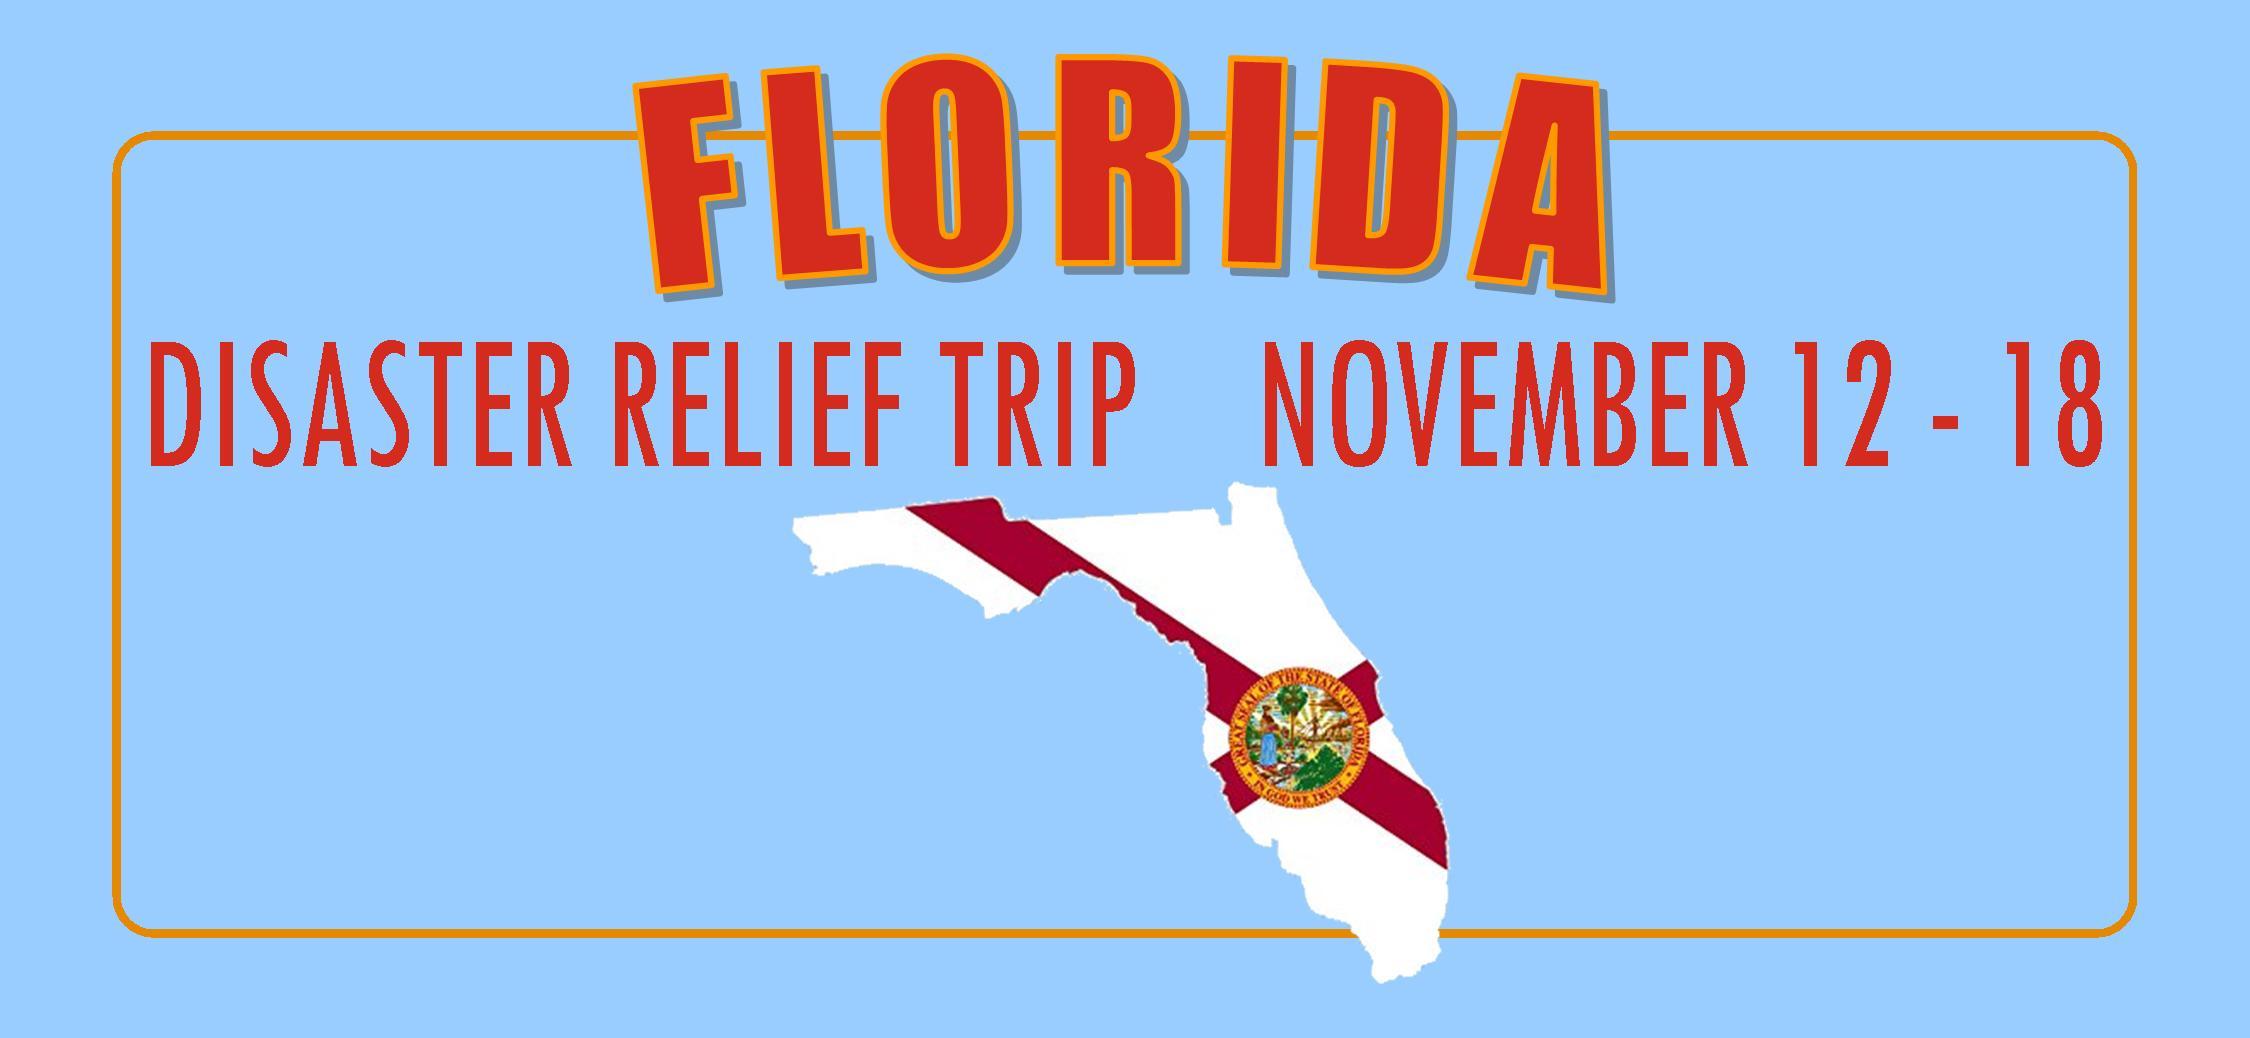 Florida Mission Trip Web Page Slider 102017.jpg